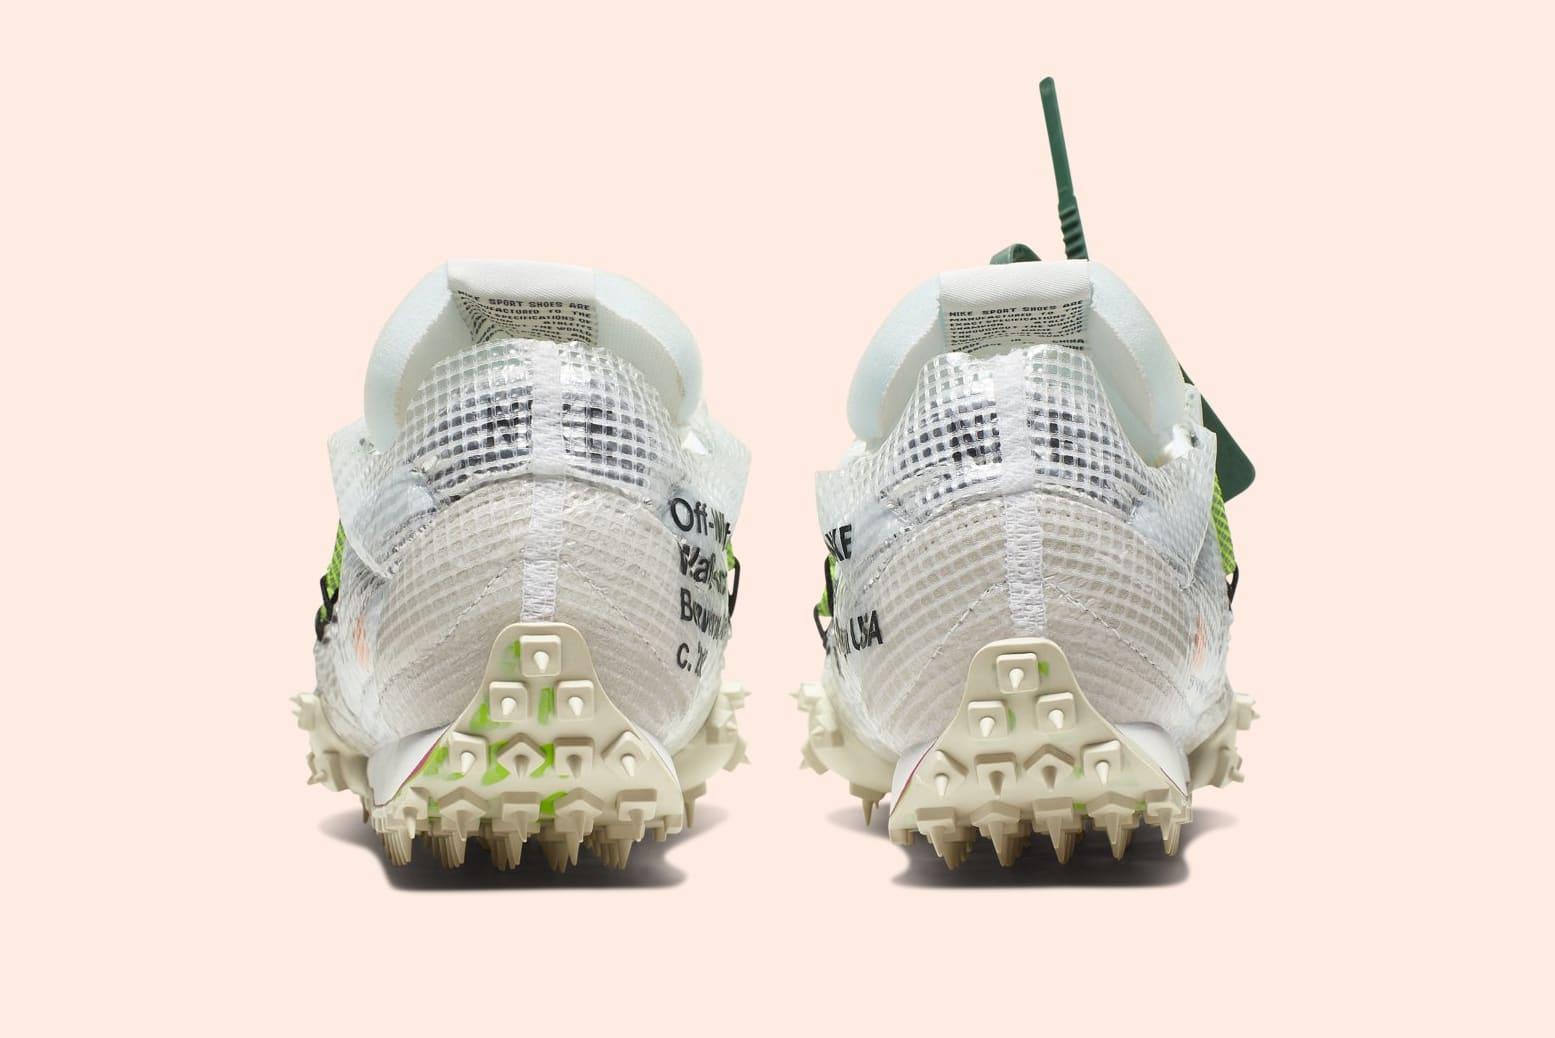 off-white-nike-waffle-racer-womens-electric-green-cd8180-100-heel